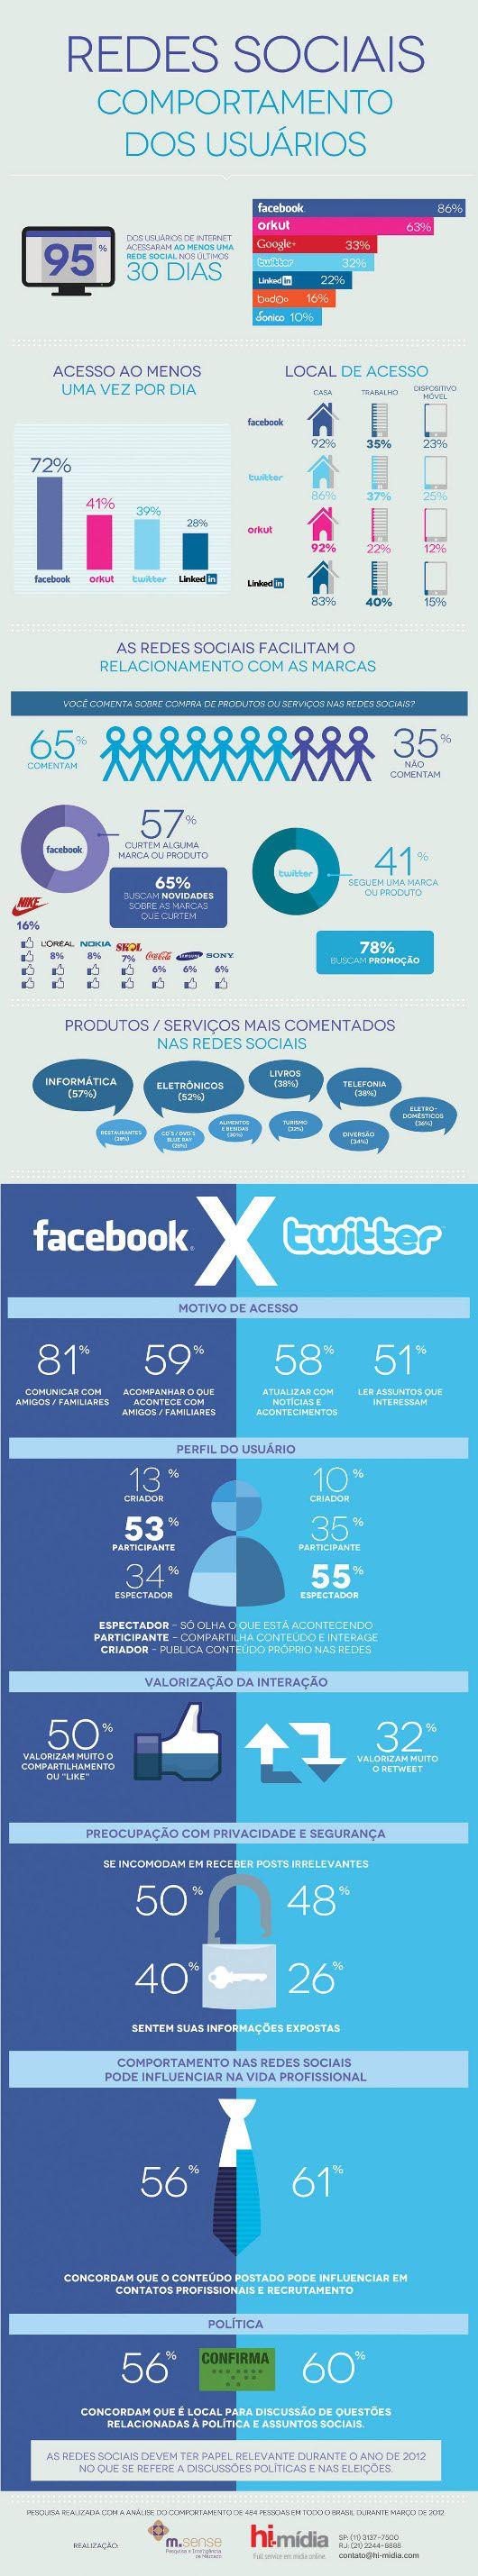 Redes Sociais no Brasil